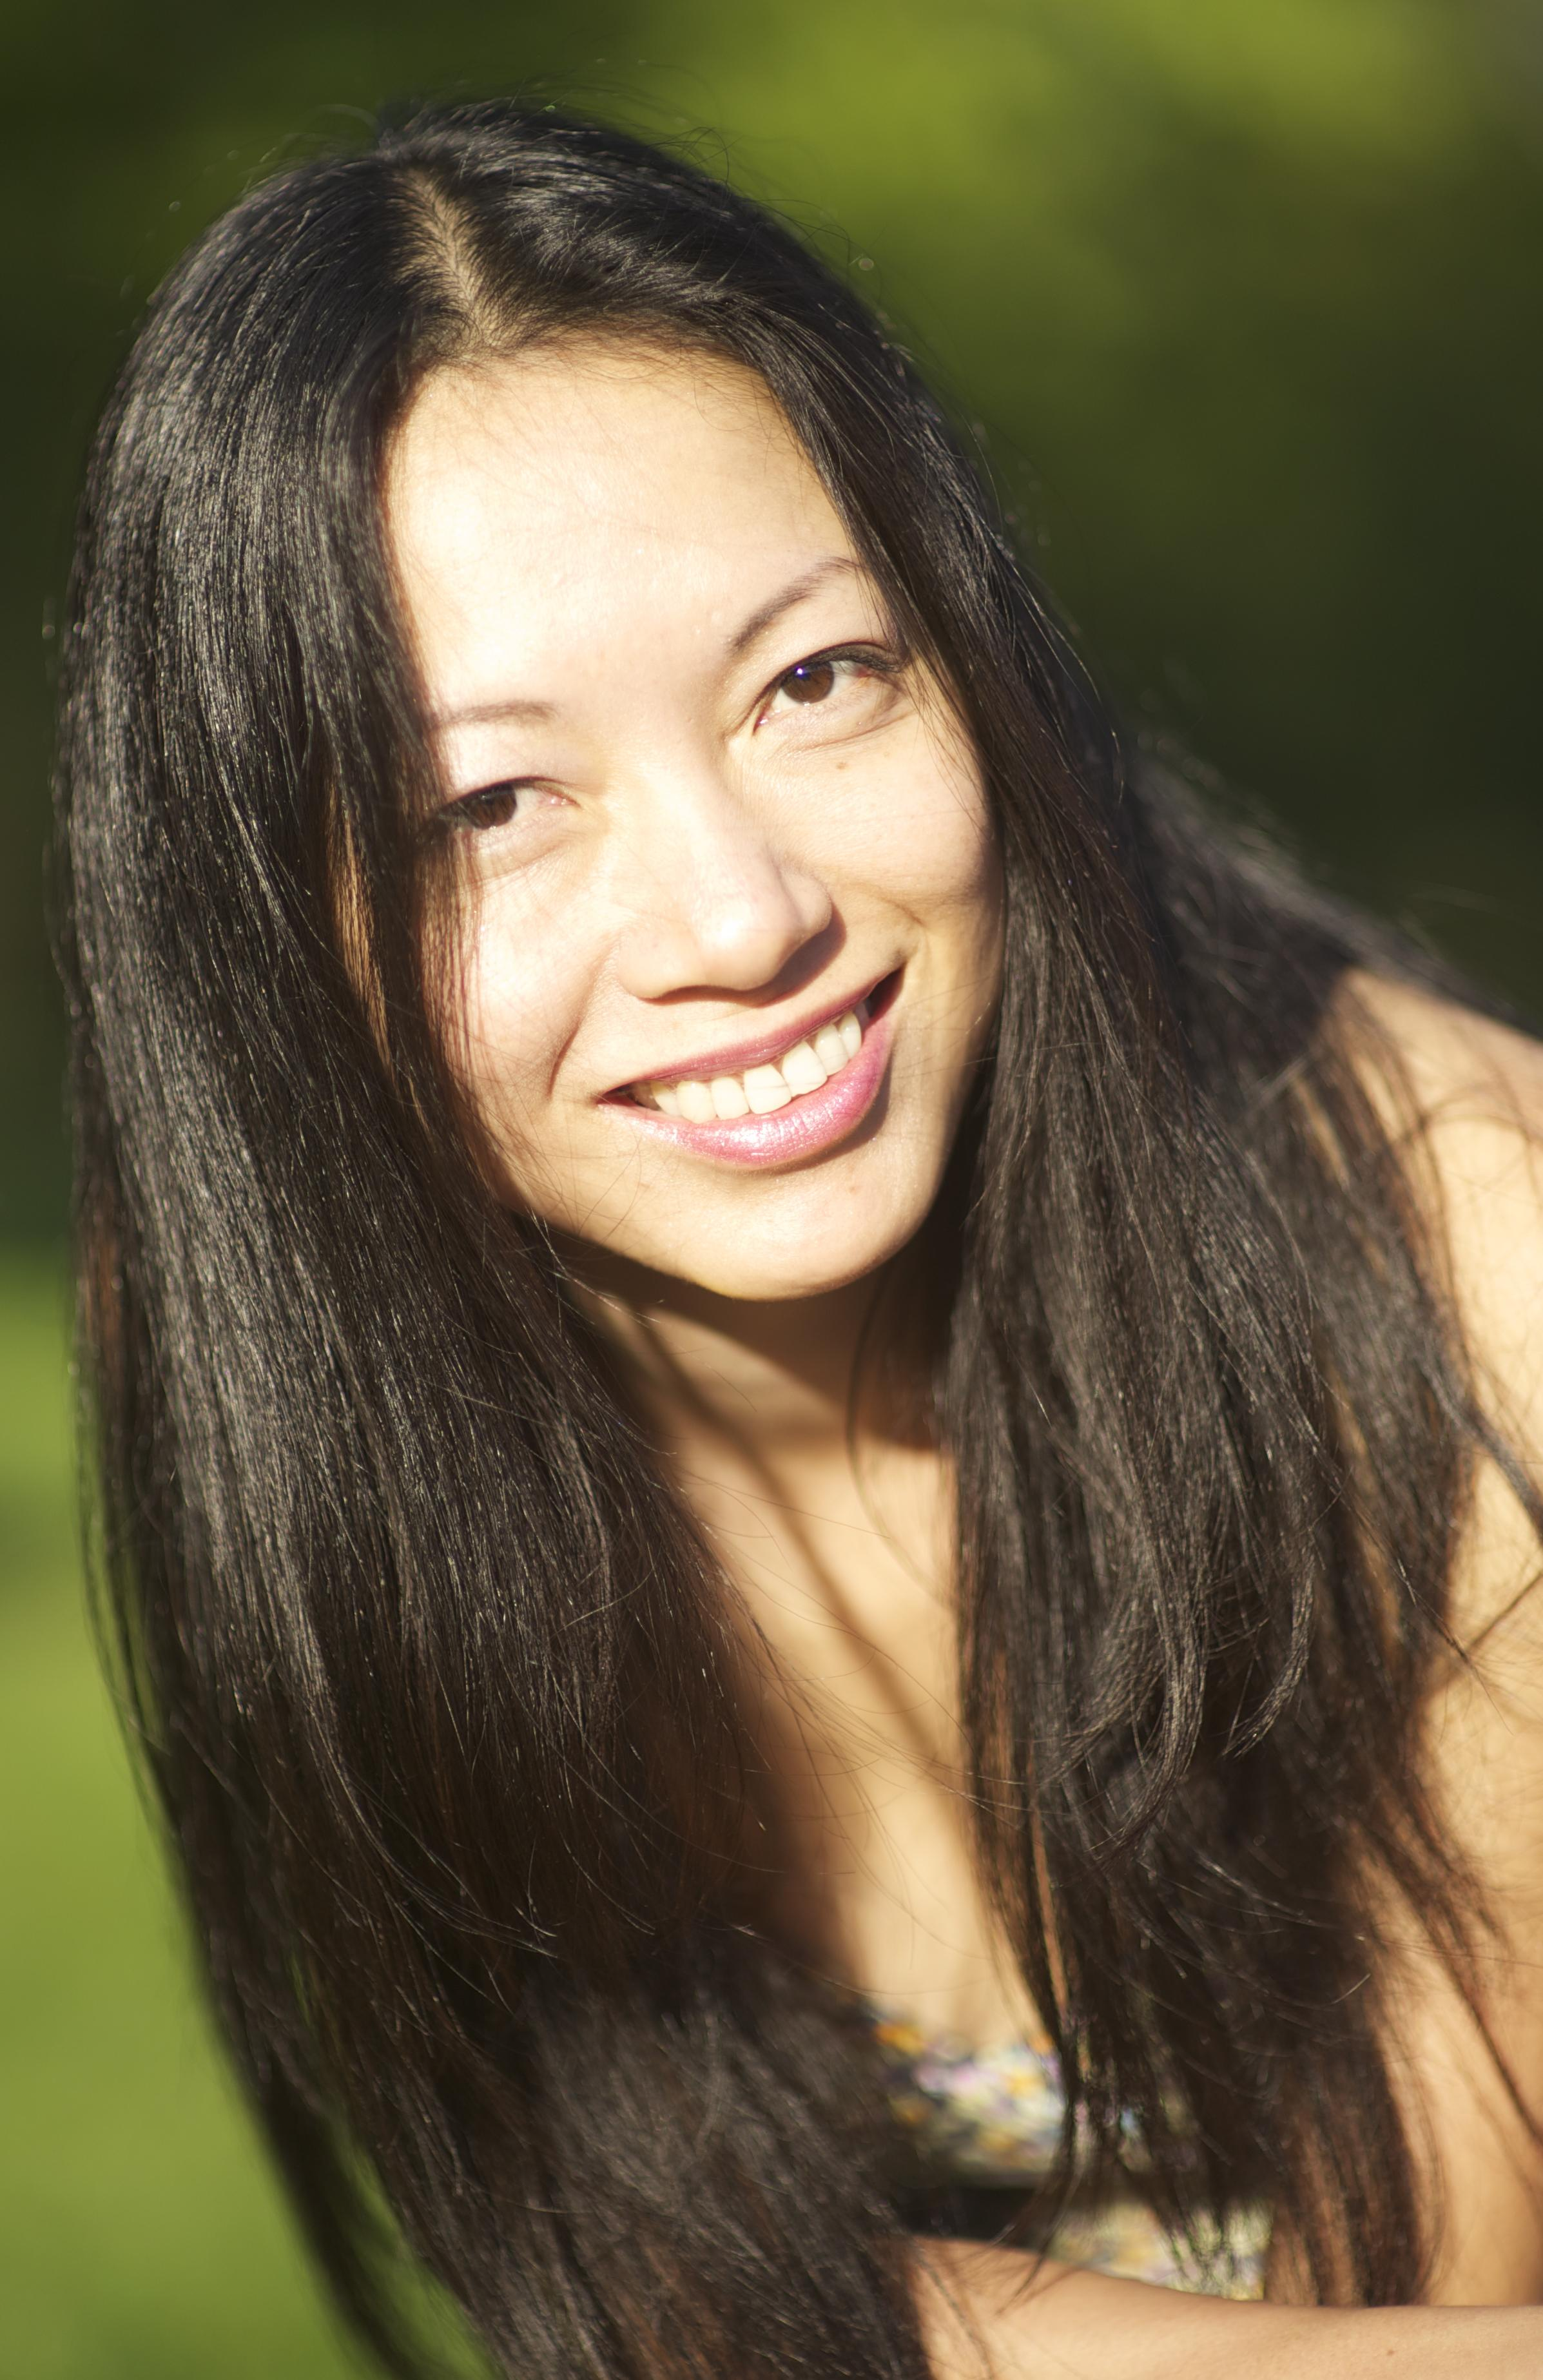 ShaoLan Hsueh